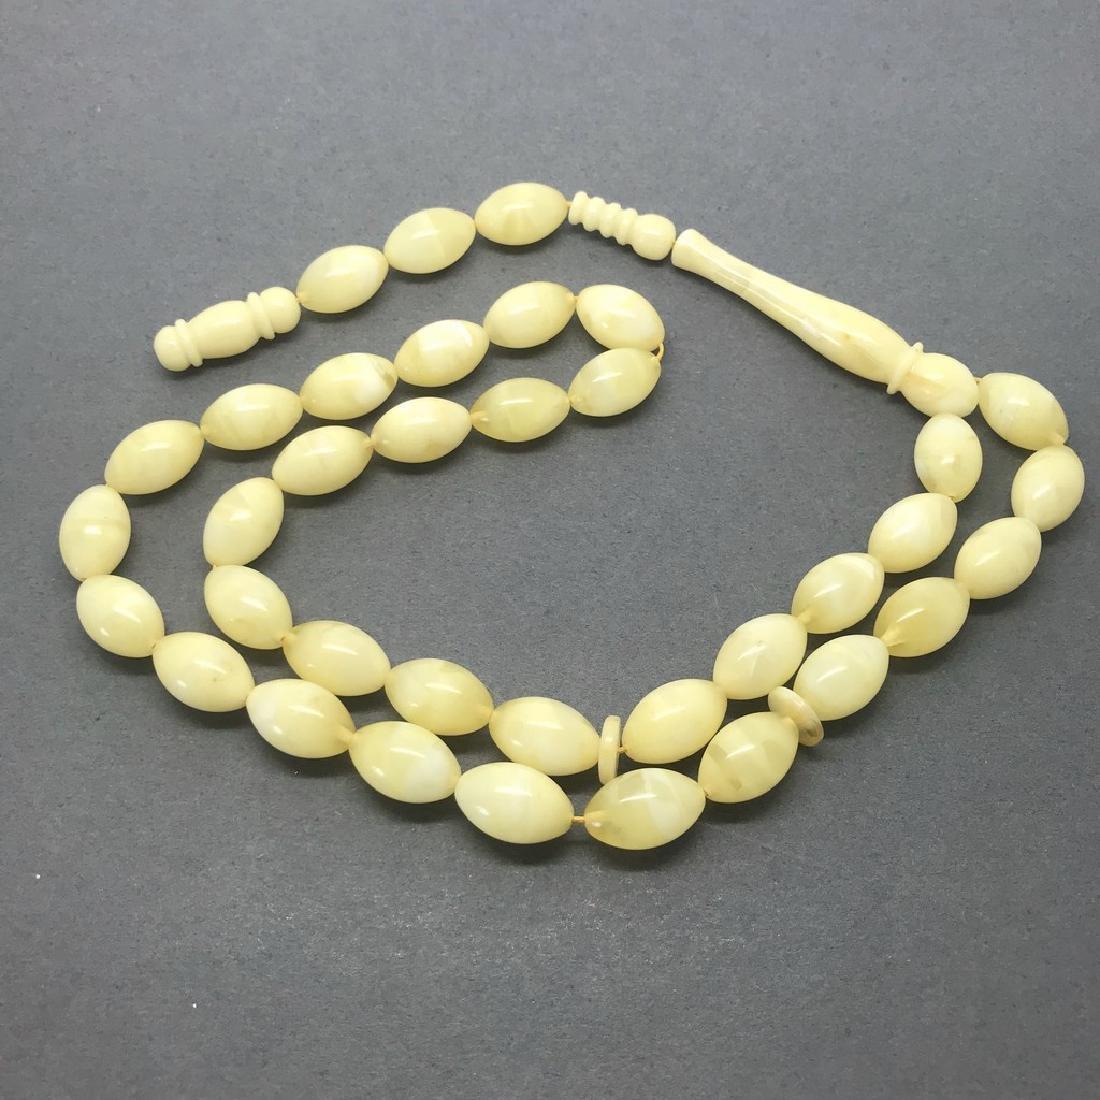 Misbaha tesbih Baltic amber white 33 beads 16x11mm 39.3